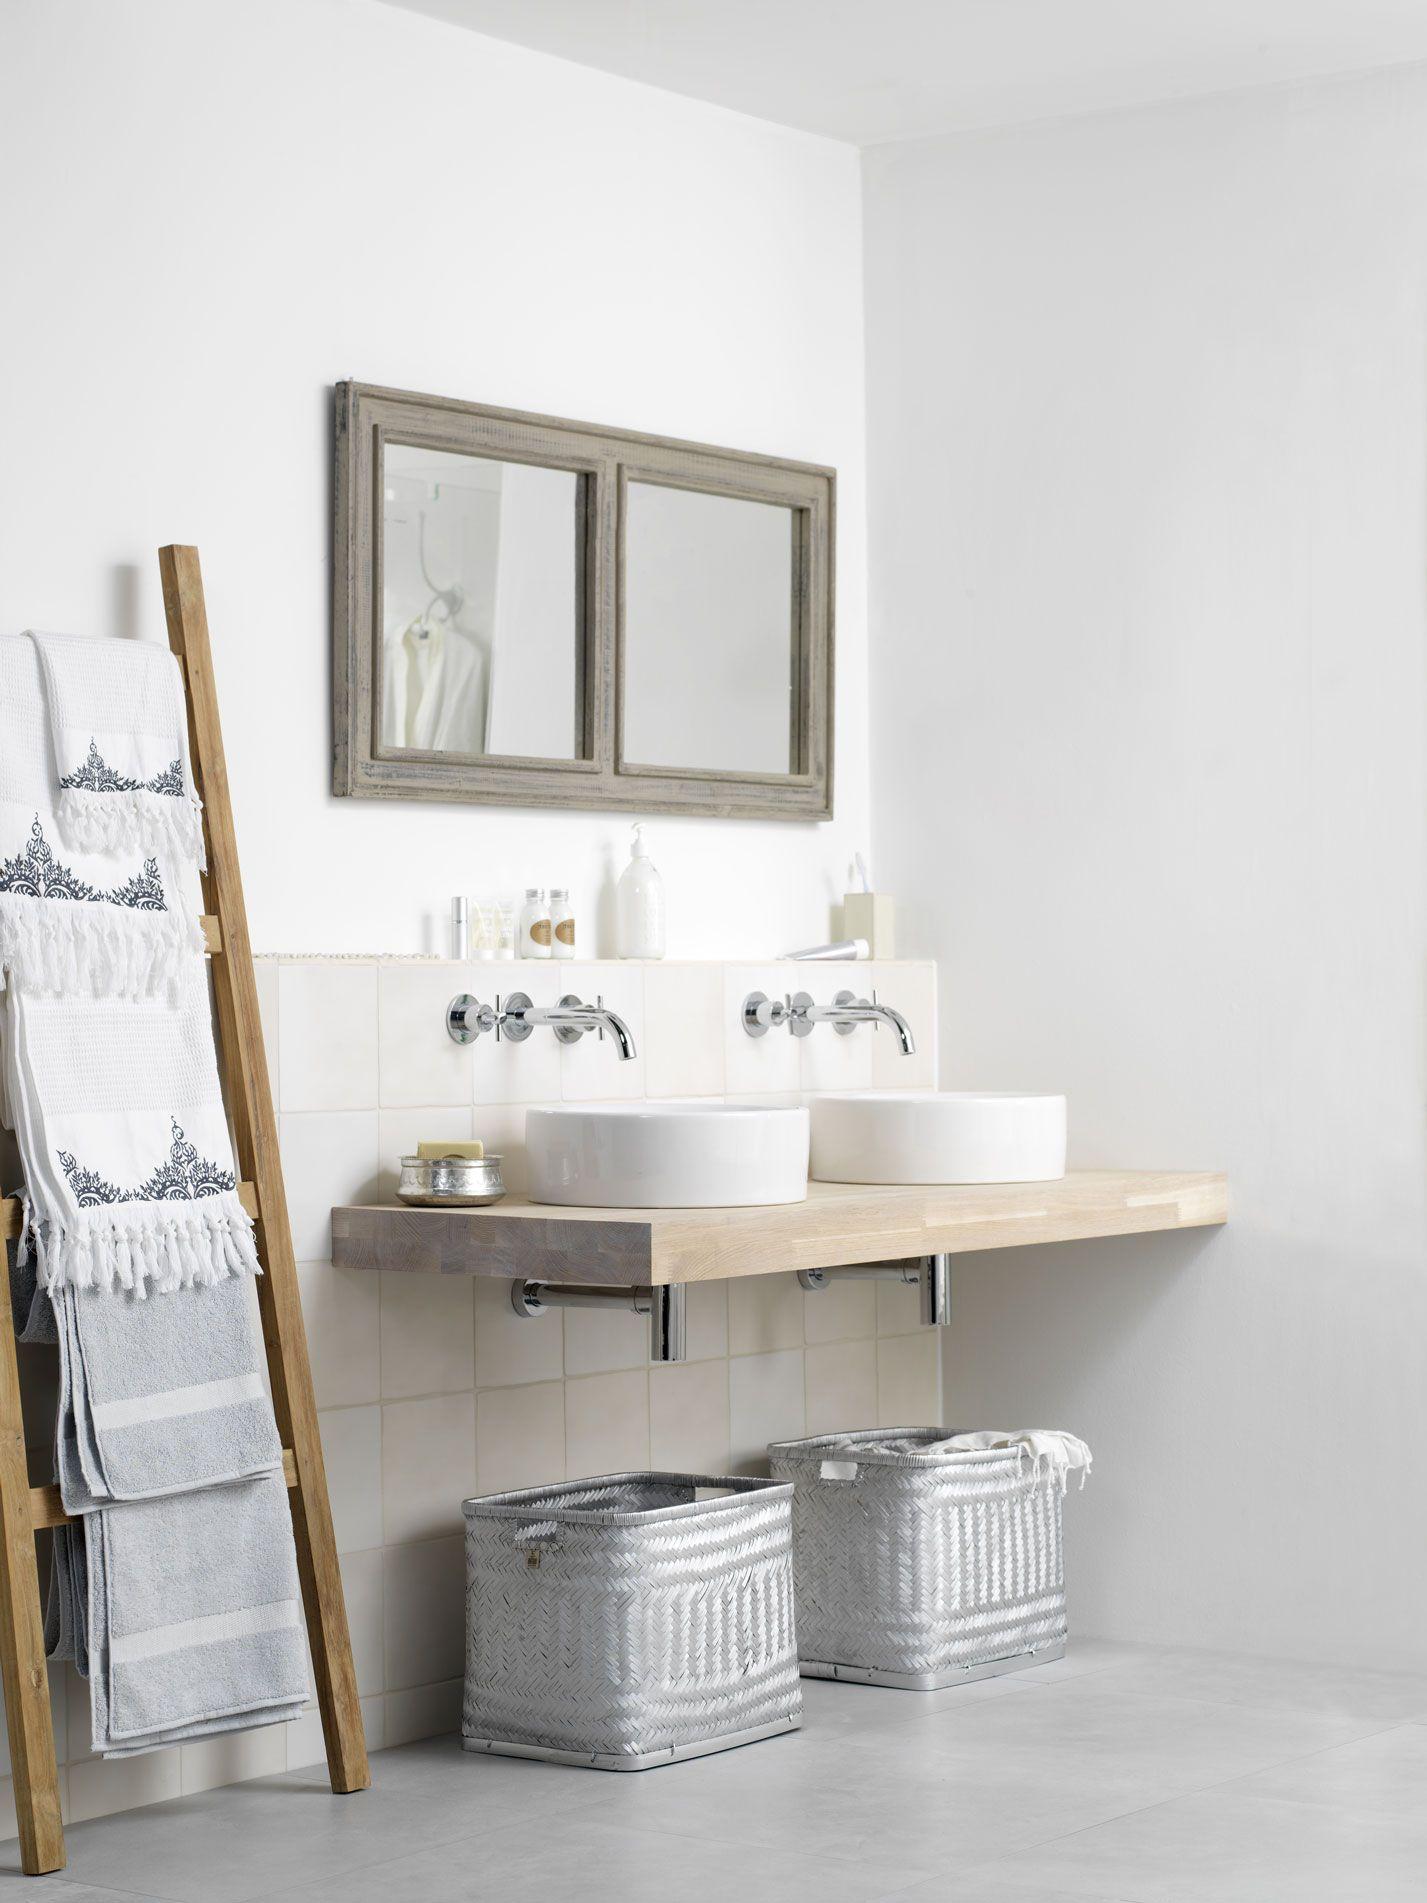 Badkamer in romantische stijl grando keuken bad for Design planken badezimmer